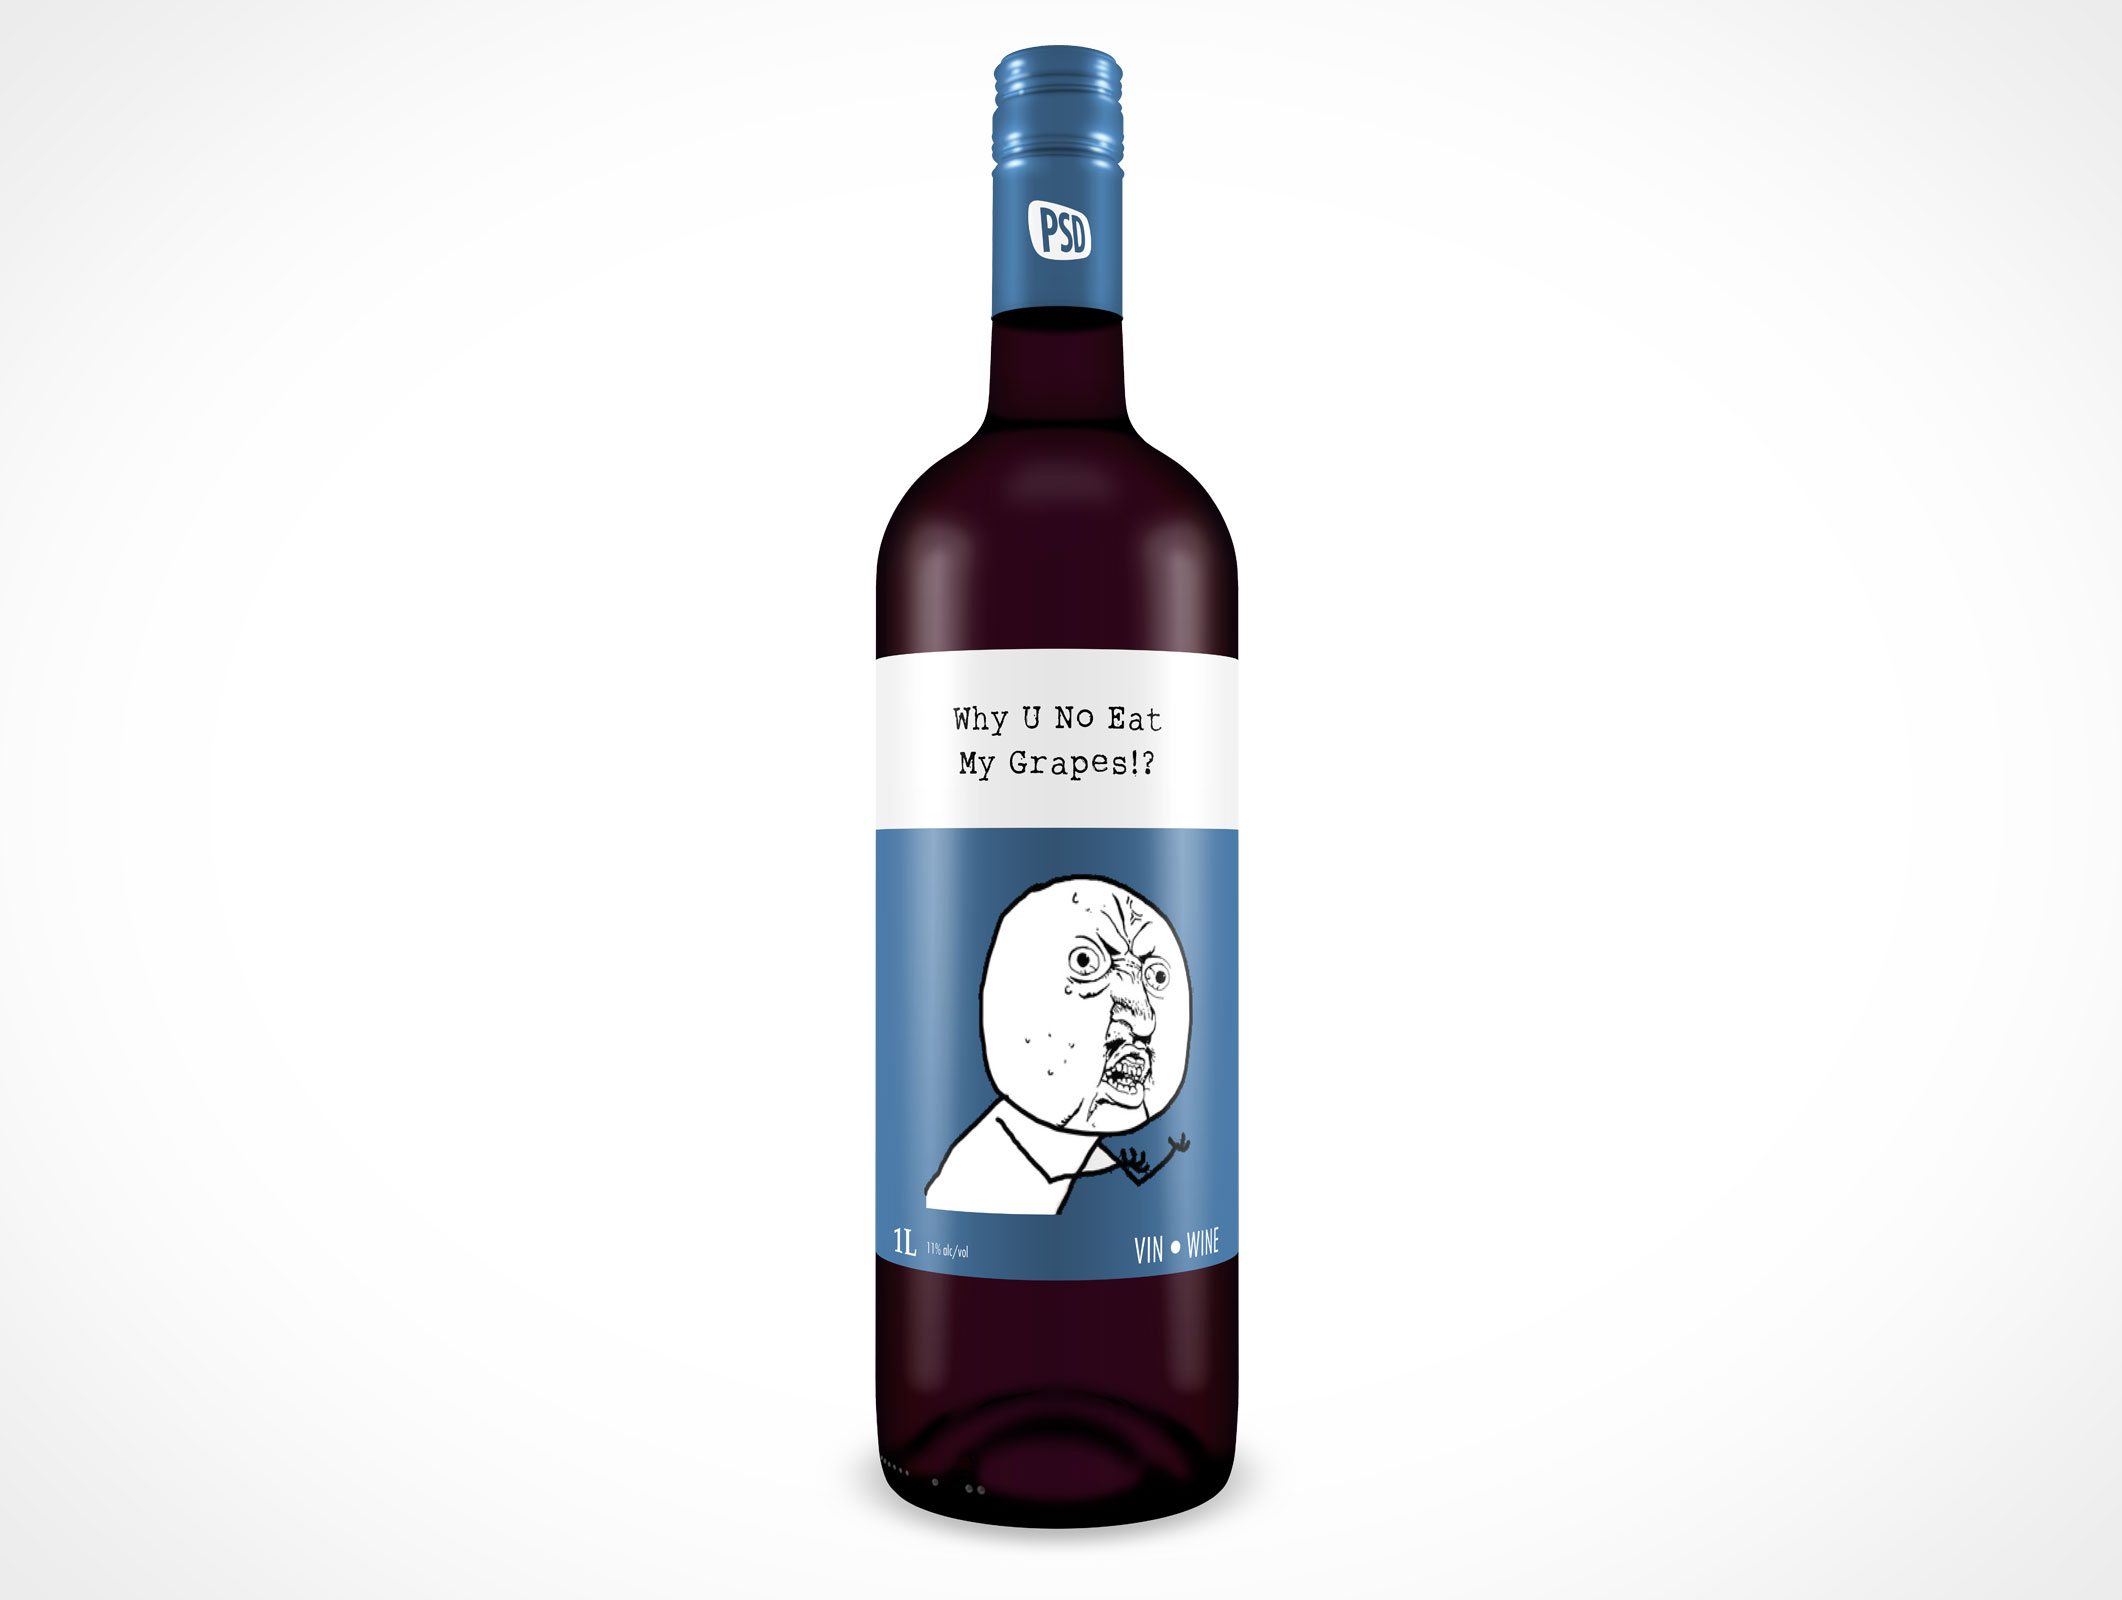 15 Liquor Bottles PSD Images